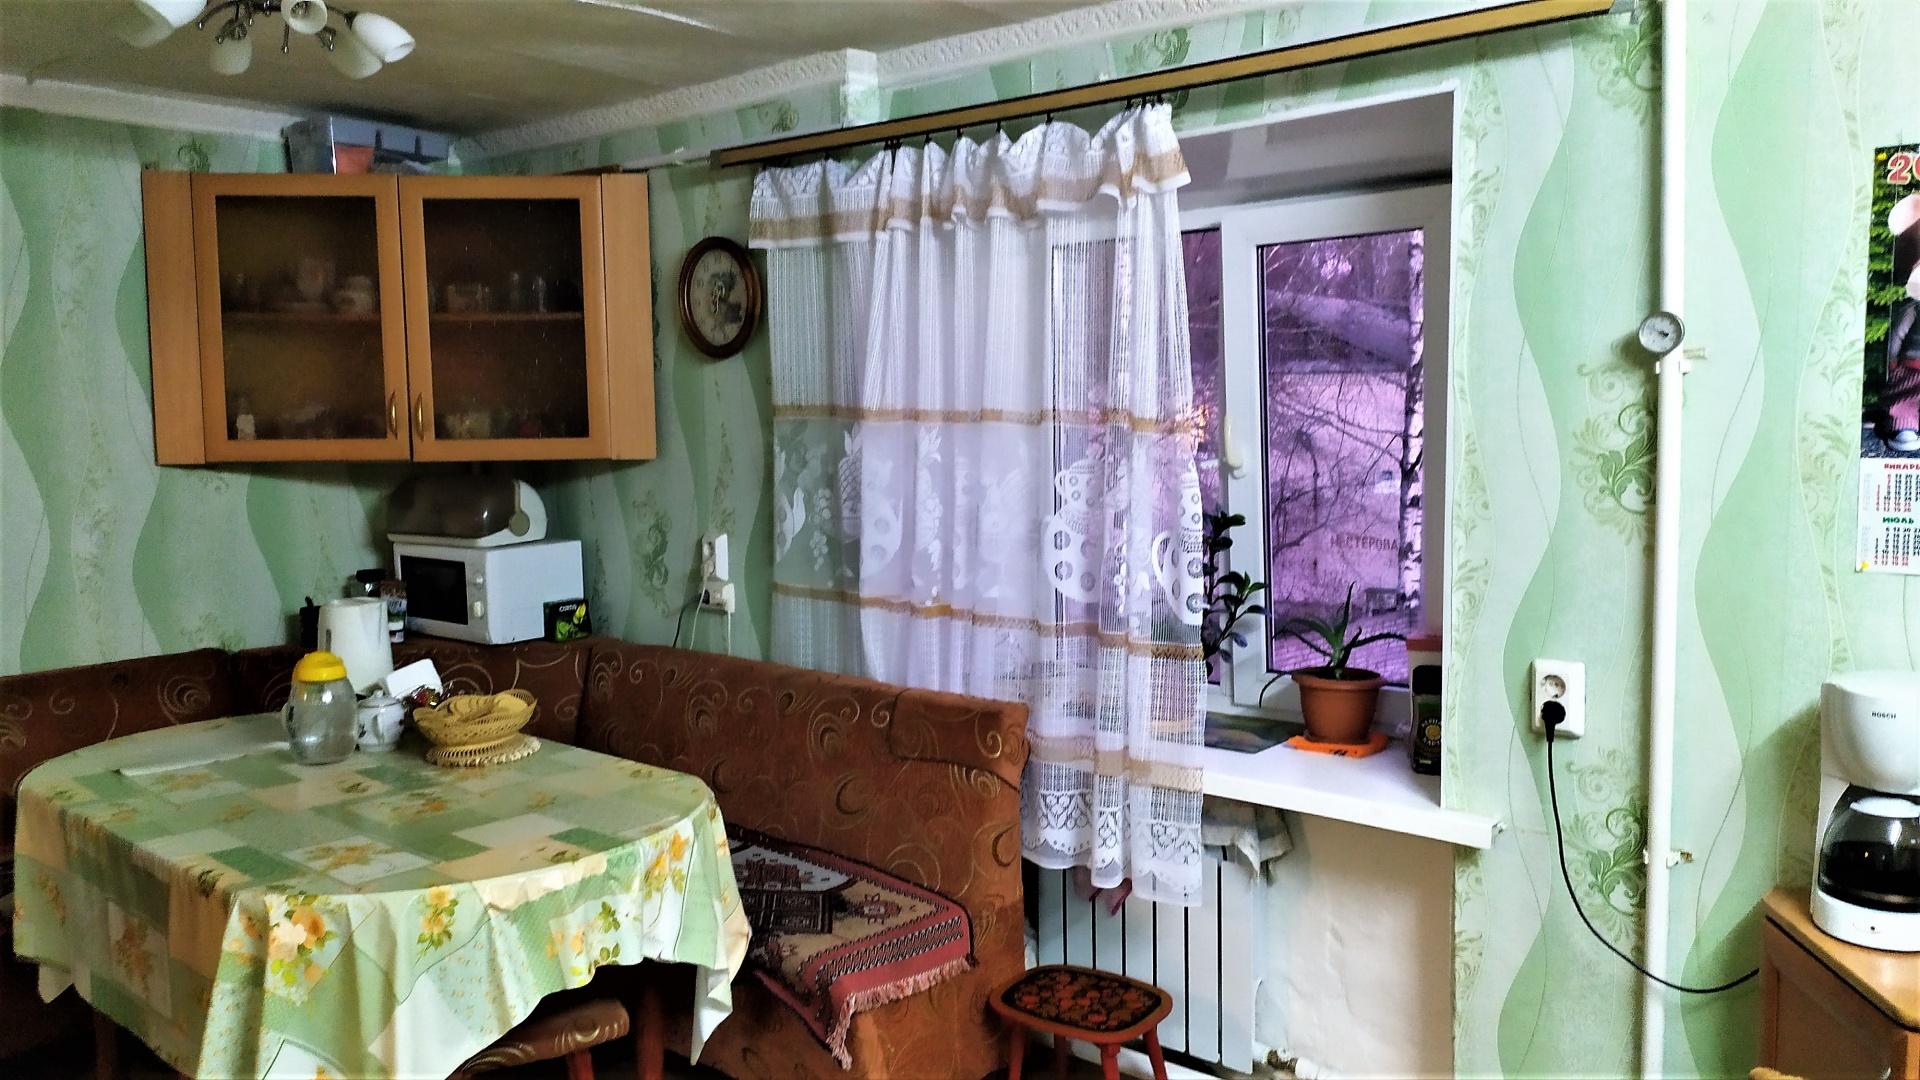 Продам трехкомнатную (3-комн.) квартиру, Красноармейский пр-кт, 11, Гатчина г